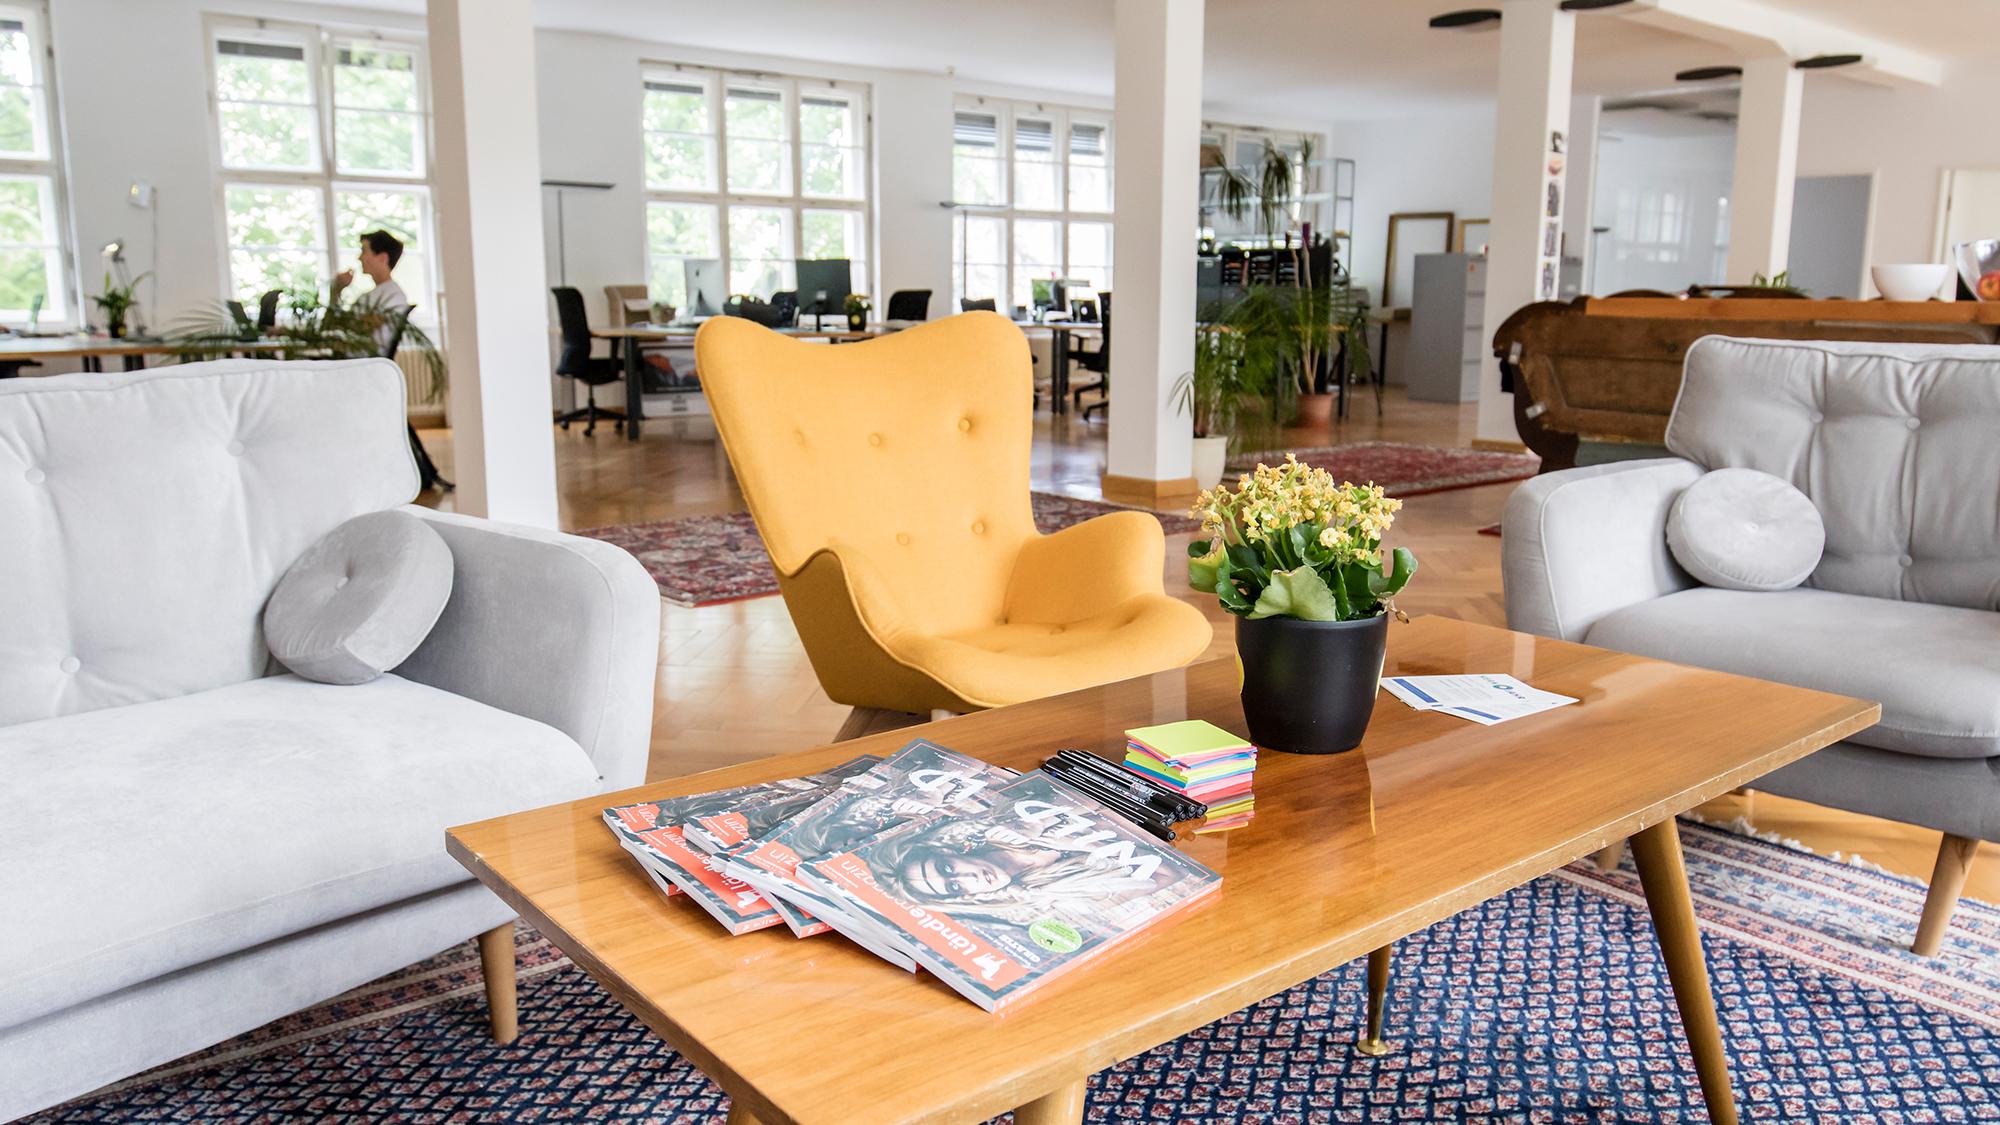 gelbe couch best tanami sofa sitzer gelb with gelbe couch elegant kleines wohndesign wandfarbe. Black Bedroom Furniture Sets. Home Design Ideas